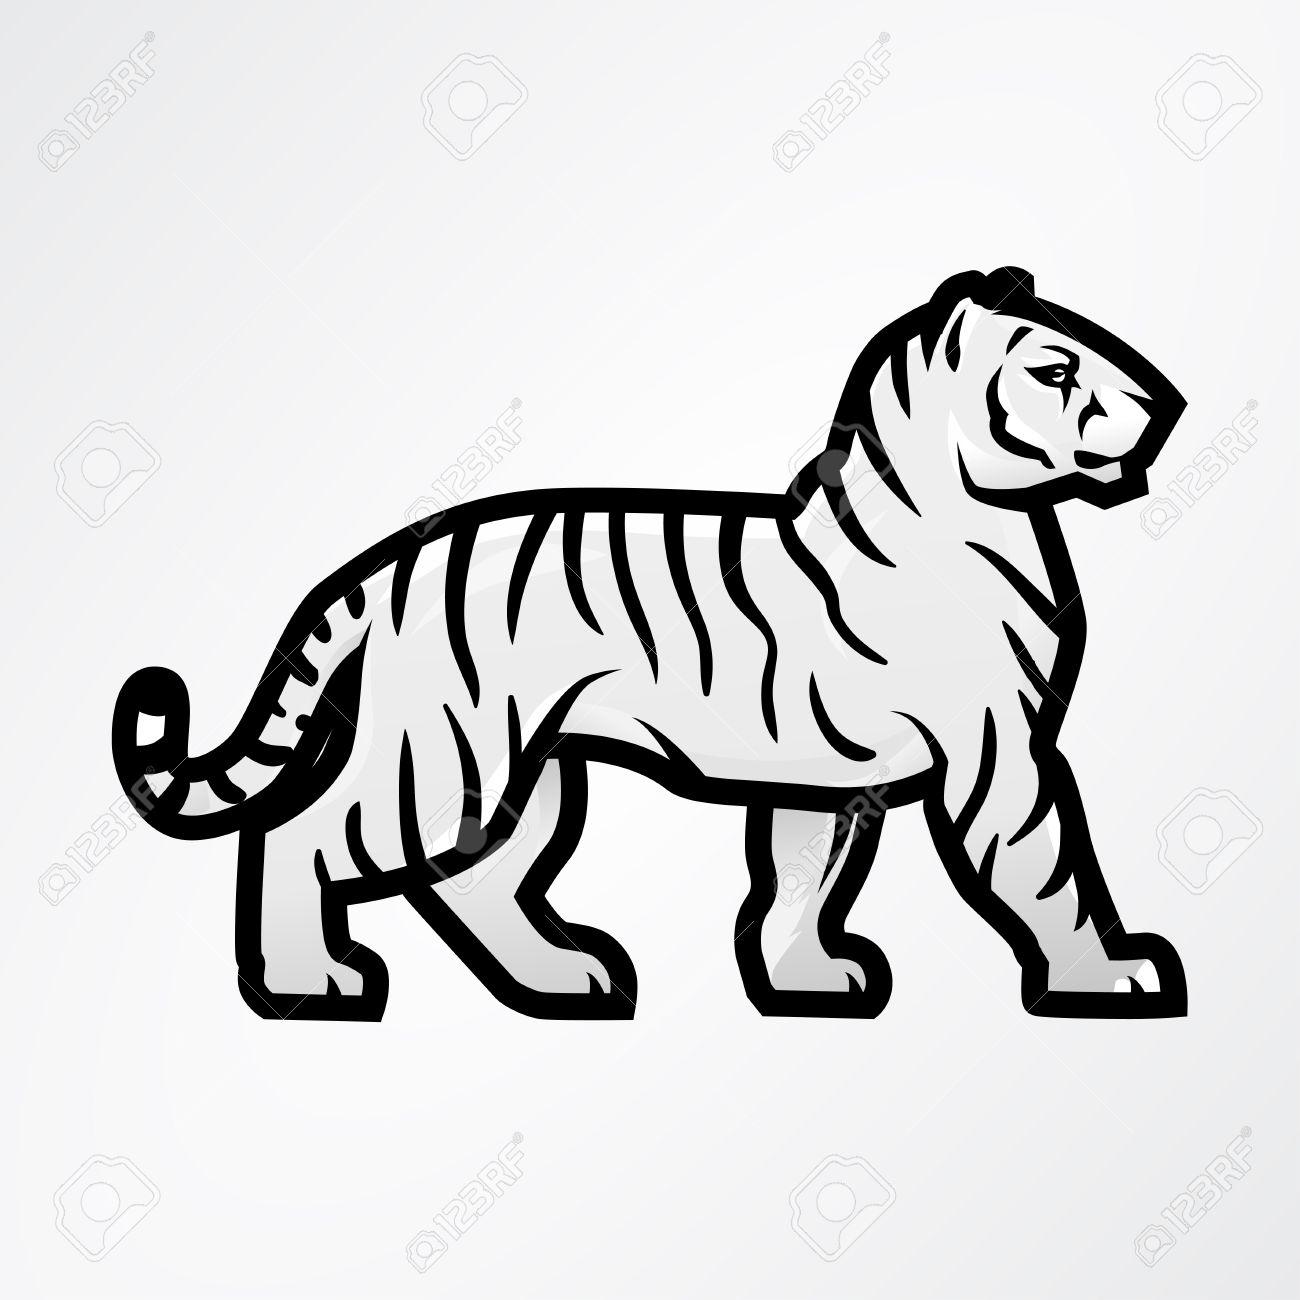 Tiger logo vector  Mascot design template  Shop or product illustration